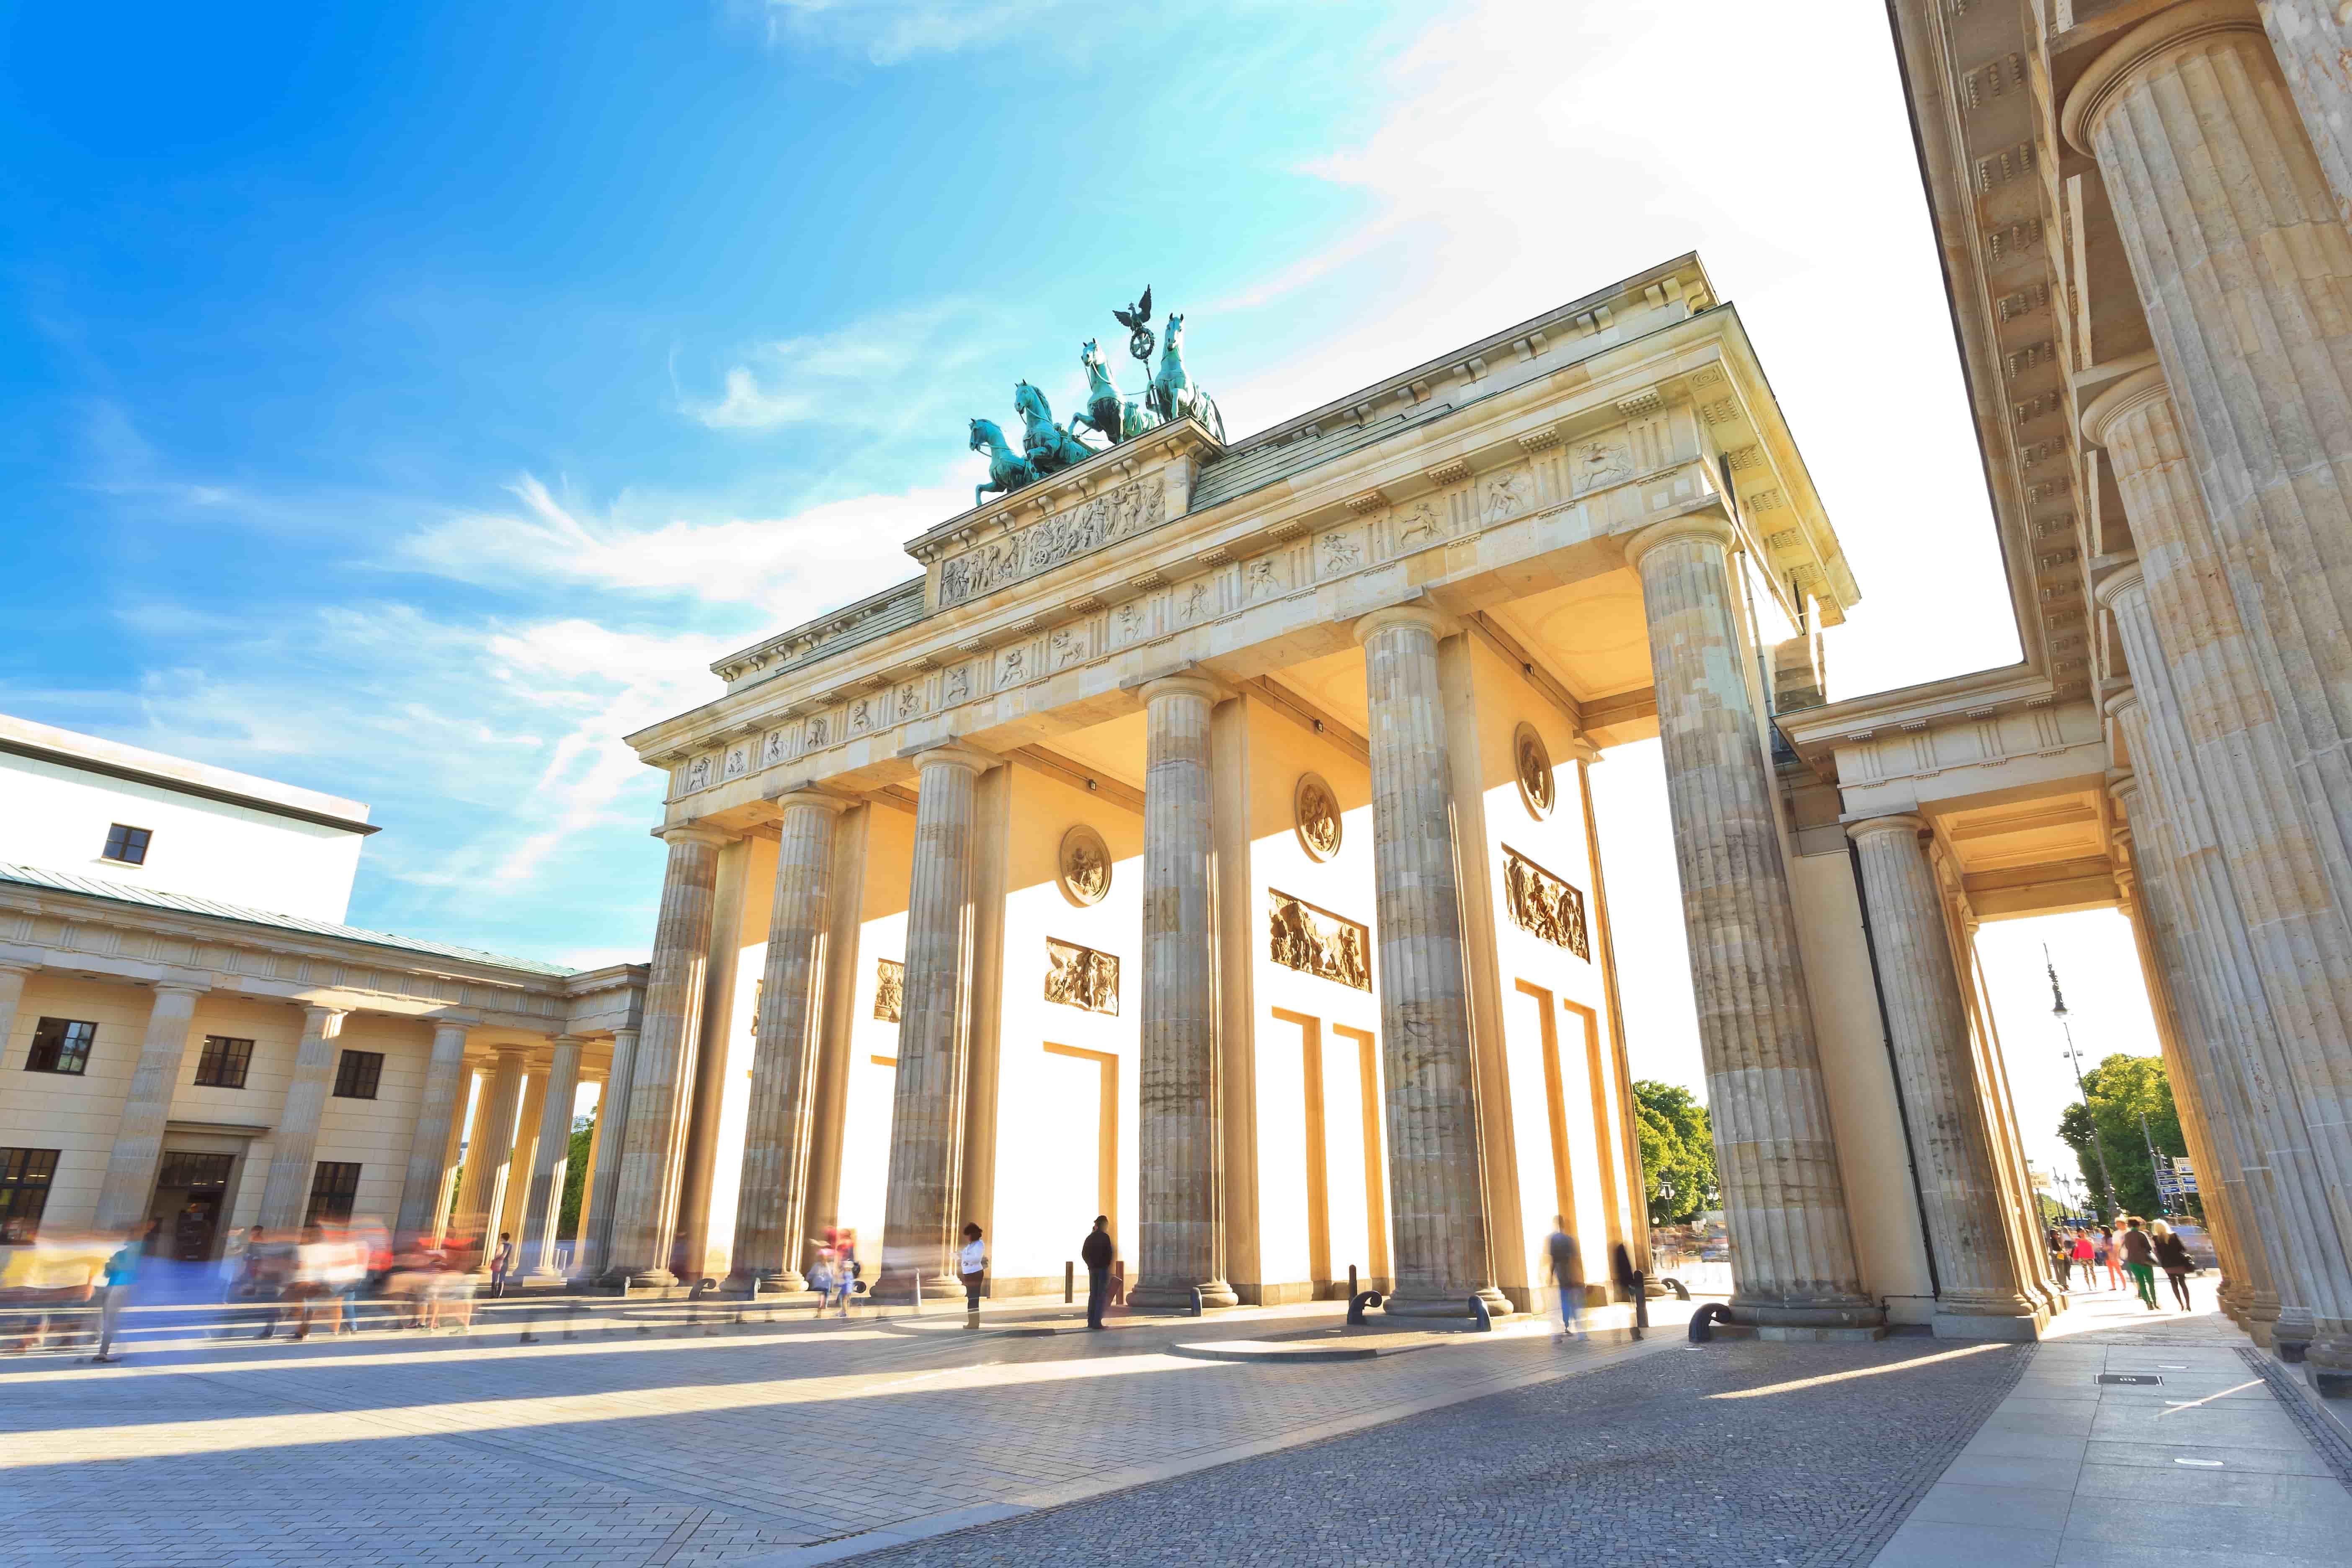 Berlin_Allemagne_Brandenburg gate of Berlin, Germany_54086714-min